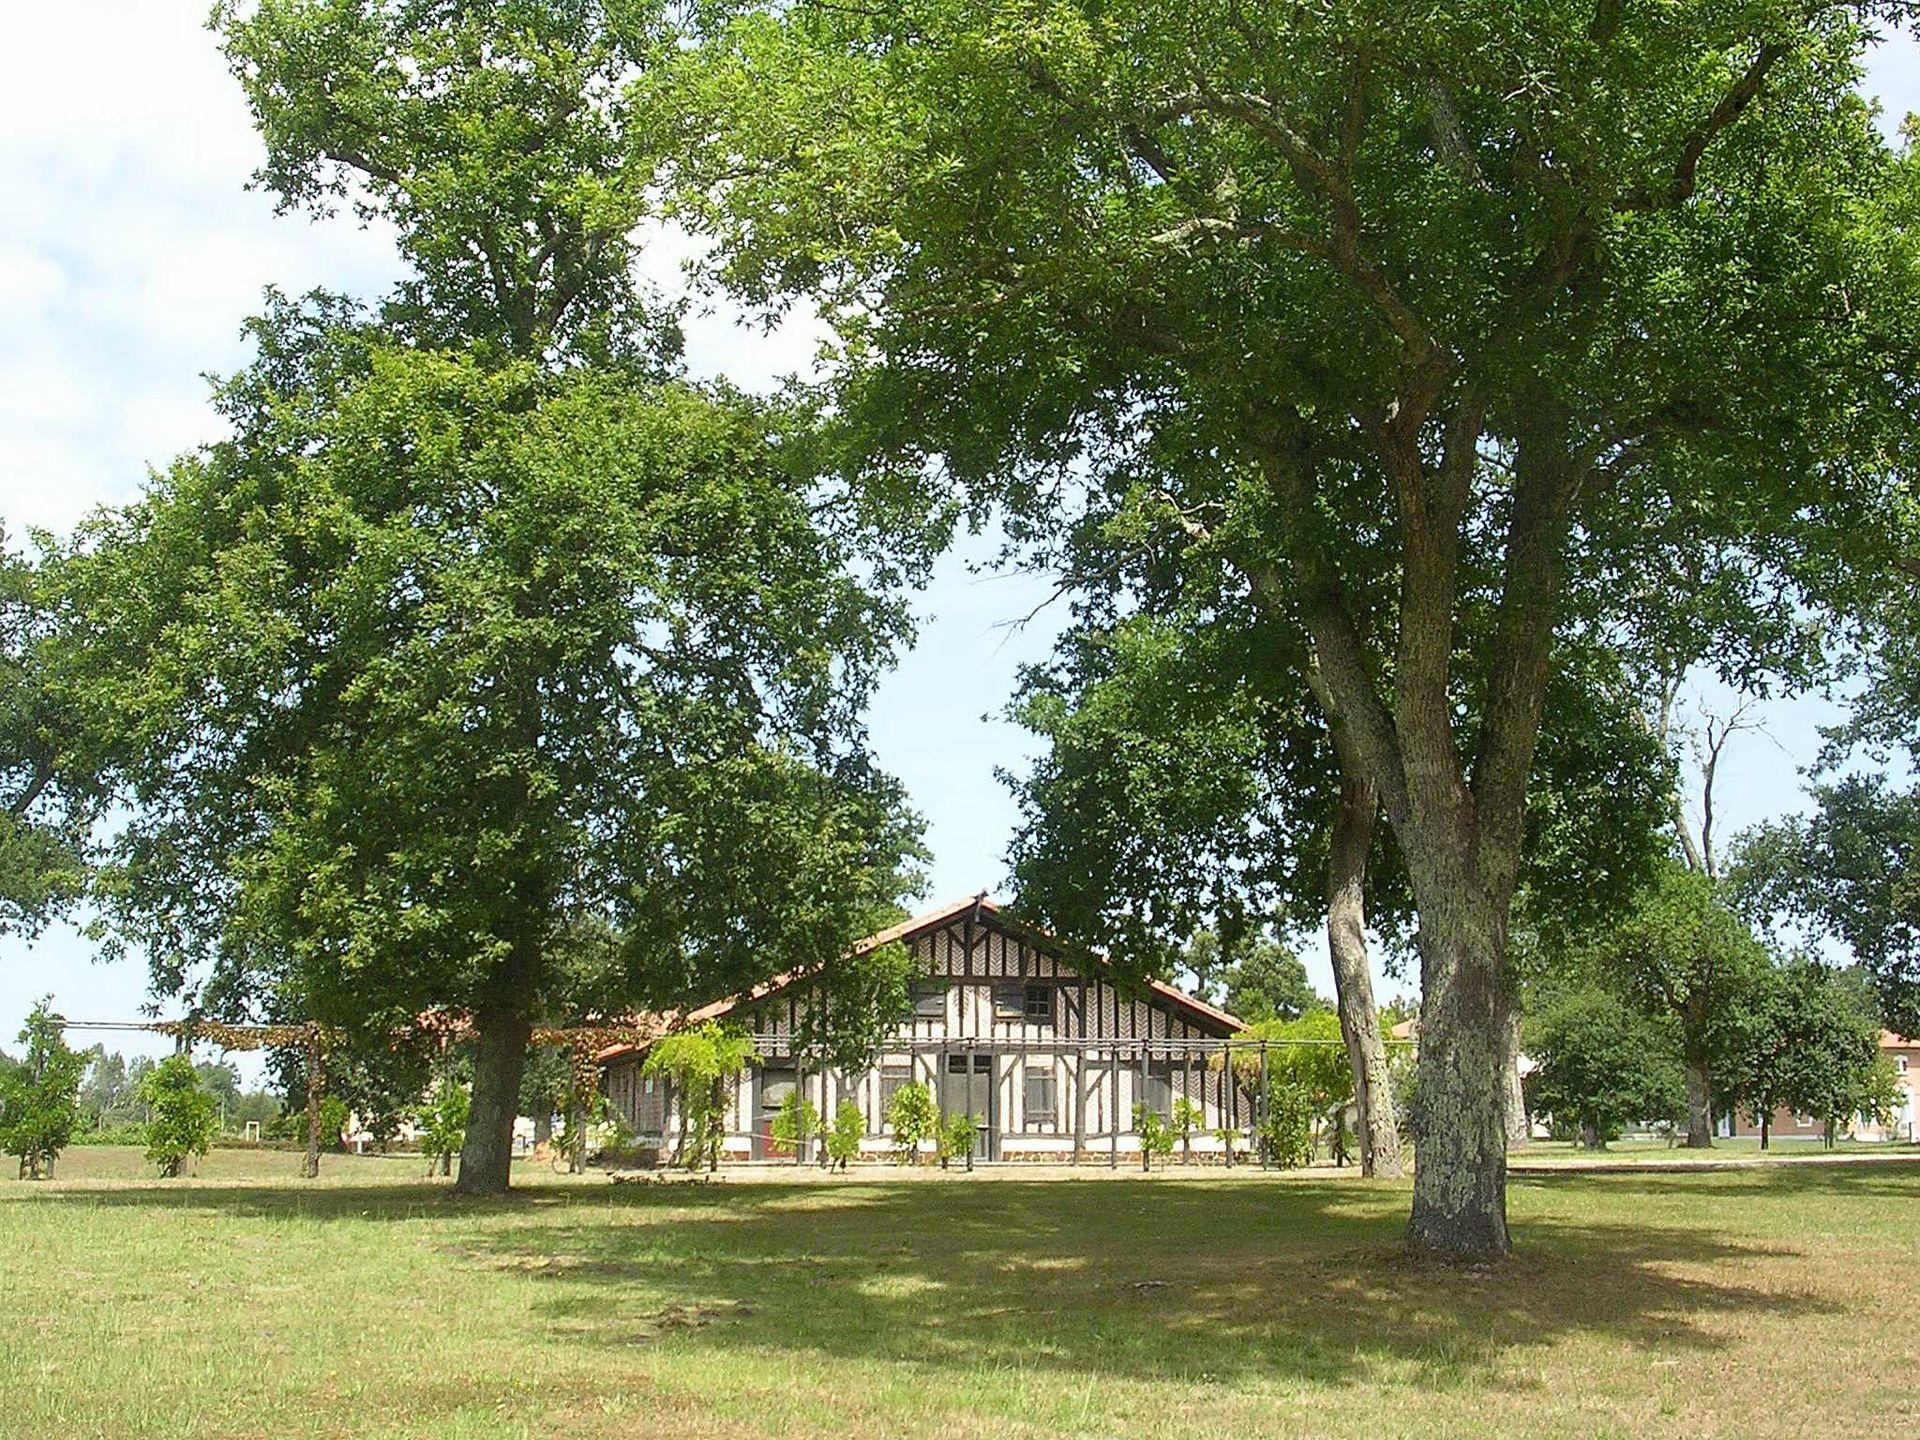 Architecture et ouvrages traditionnels en occitanie for Ouvrage architectural